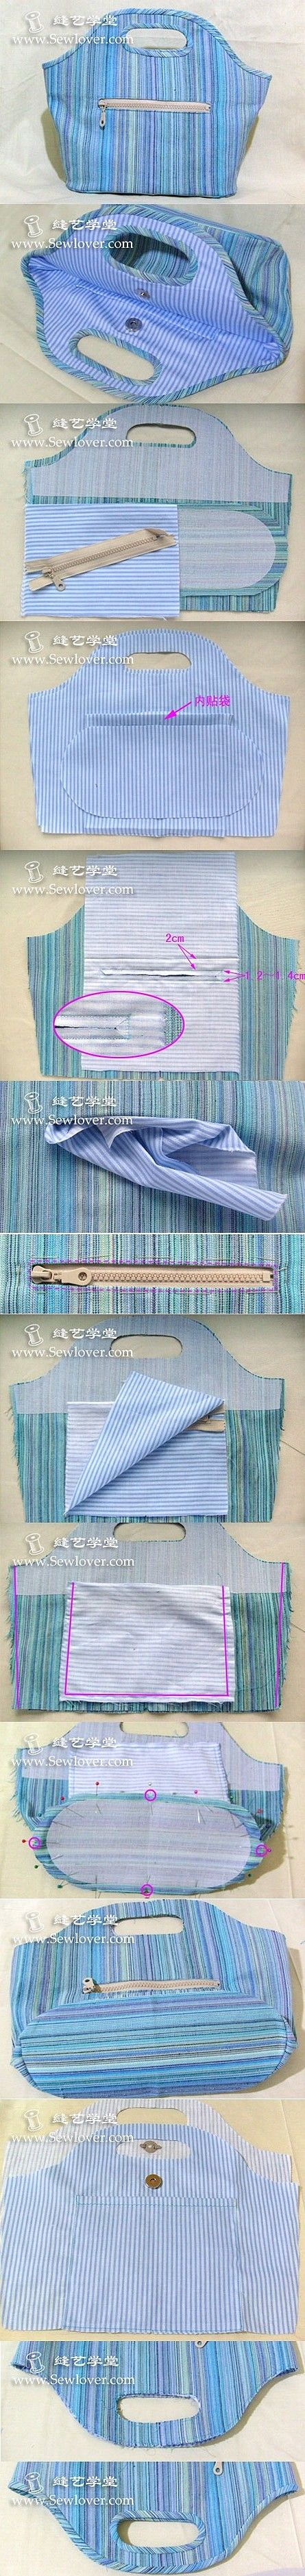 Handmade DIY holiday 闲包 wrapped 做法